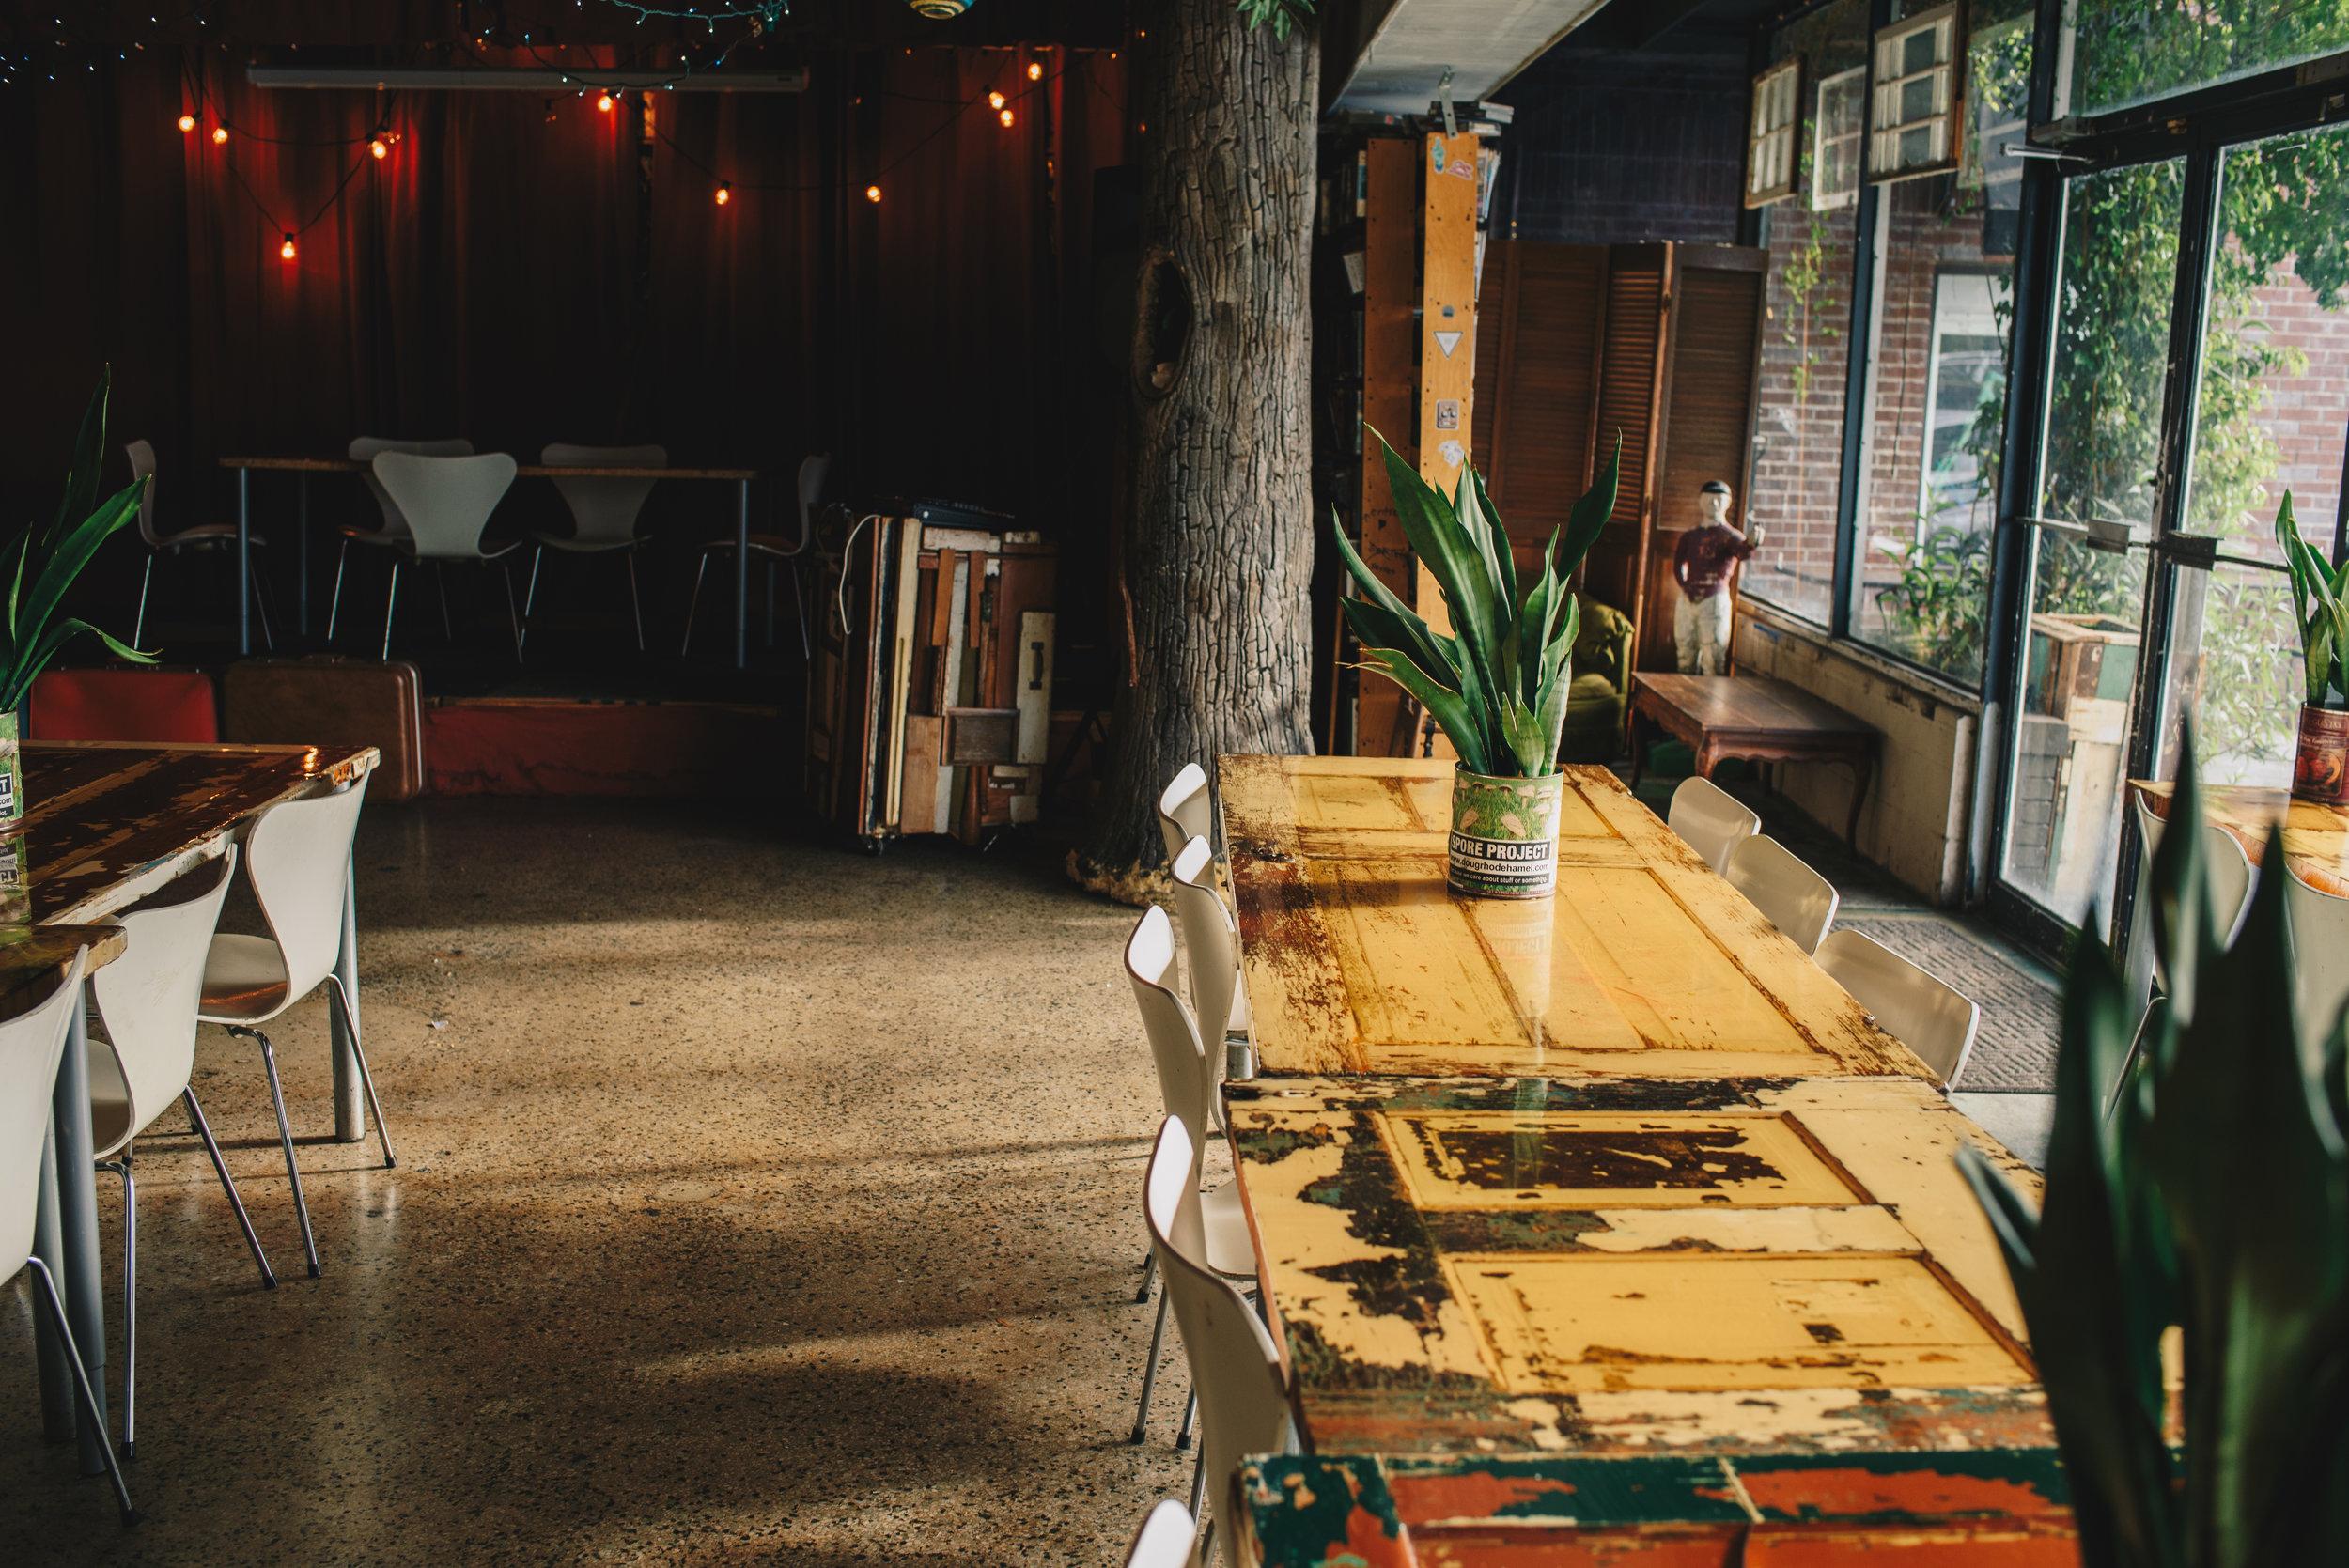 Los-Vargas-photo-coffee-shop-engagement-session-5.jpg